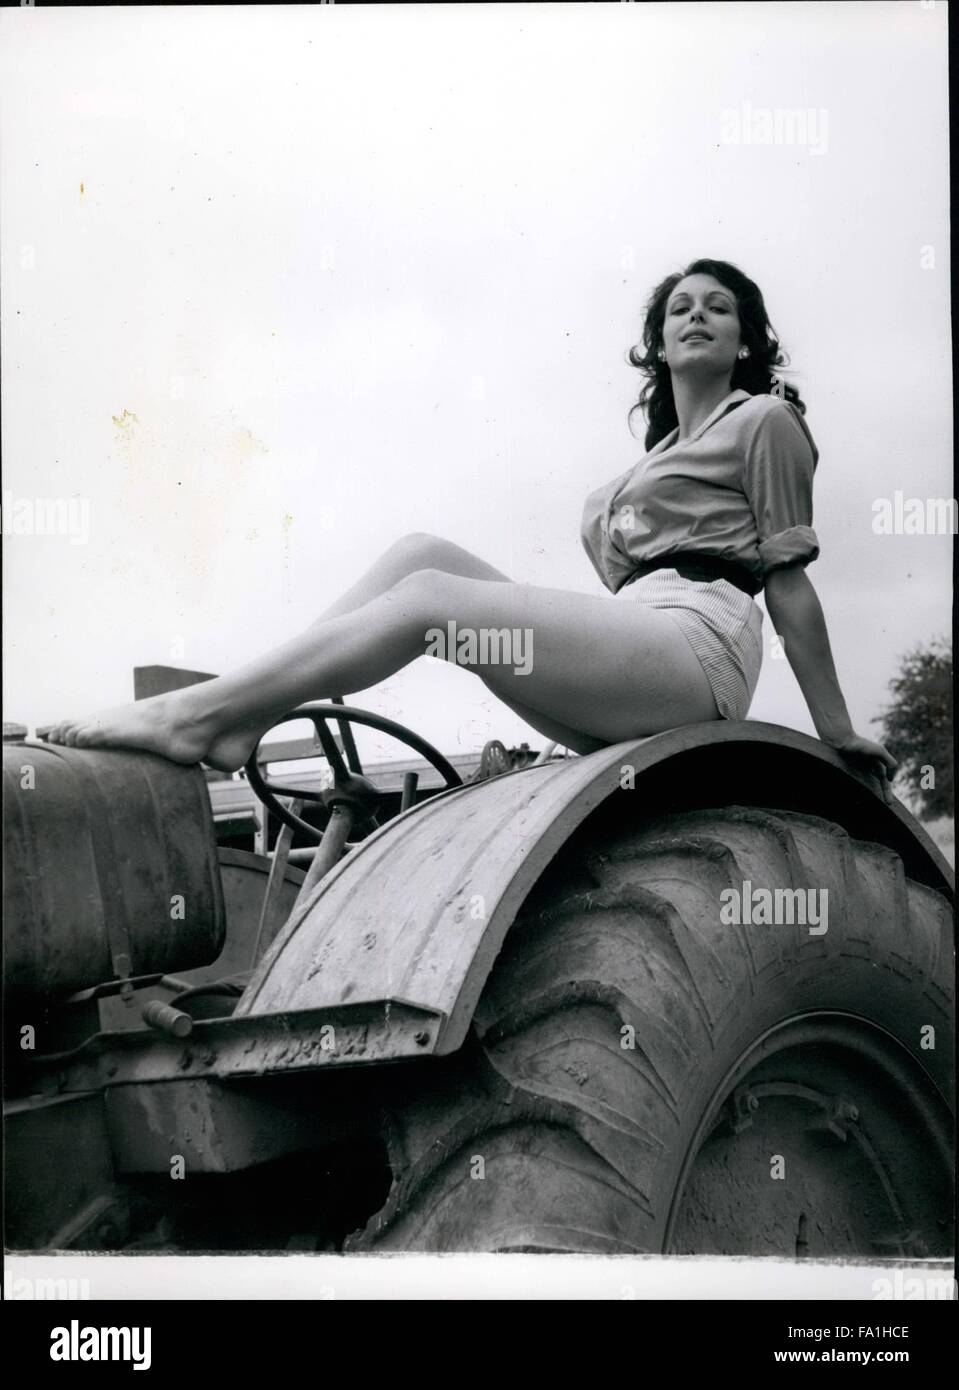 Usa News Live >> 1964 Marie Devereaux C Keystone Pictures Usa Zumapress Com Alamy